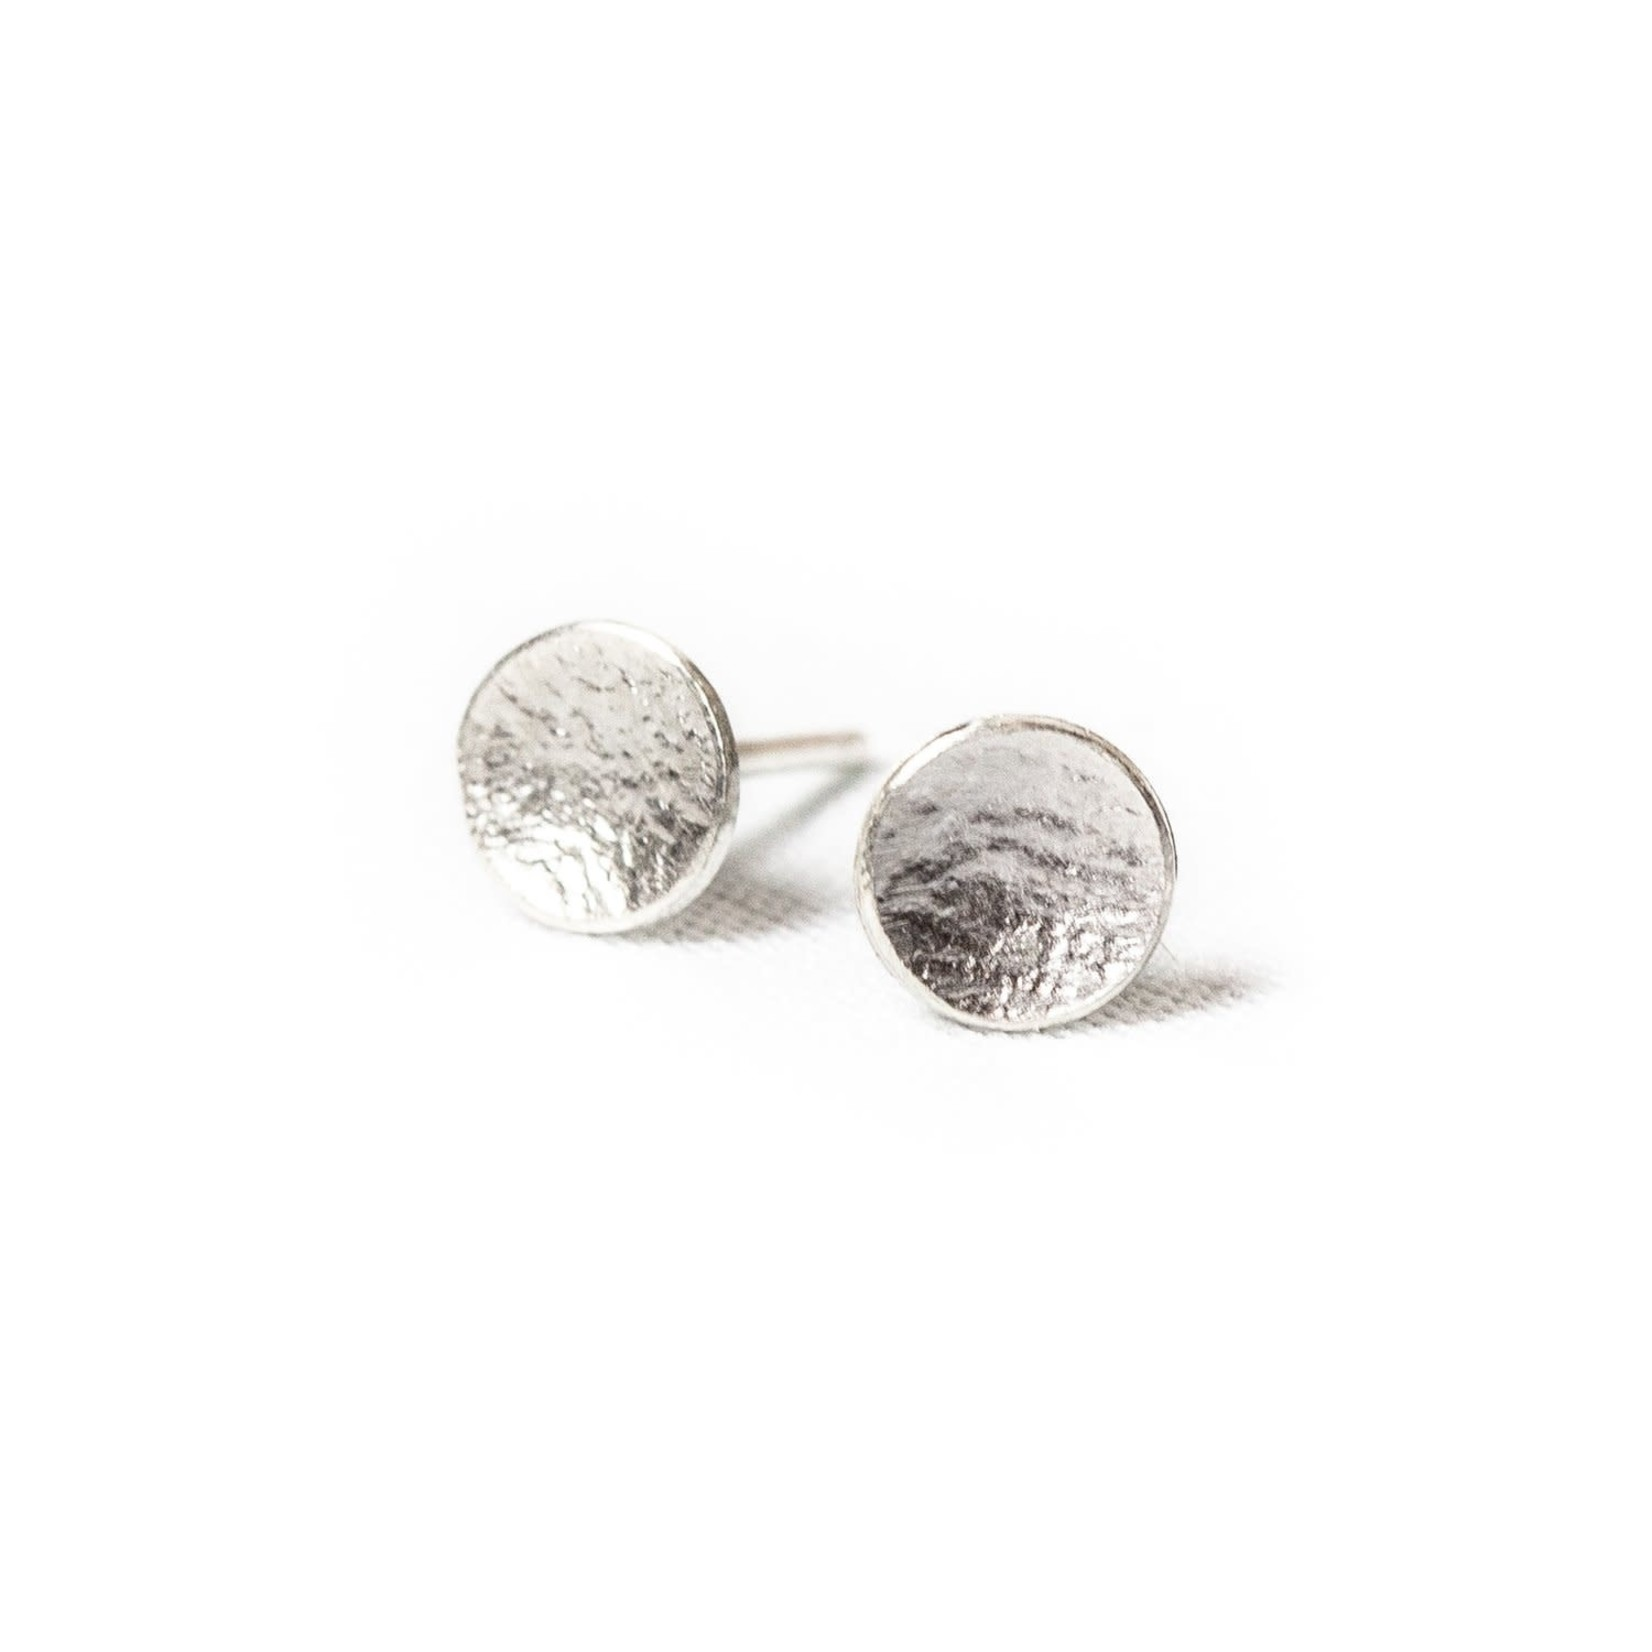 Lisa Fletcher Mini Orb Sand Studs Earrings